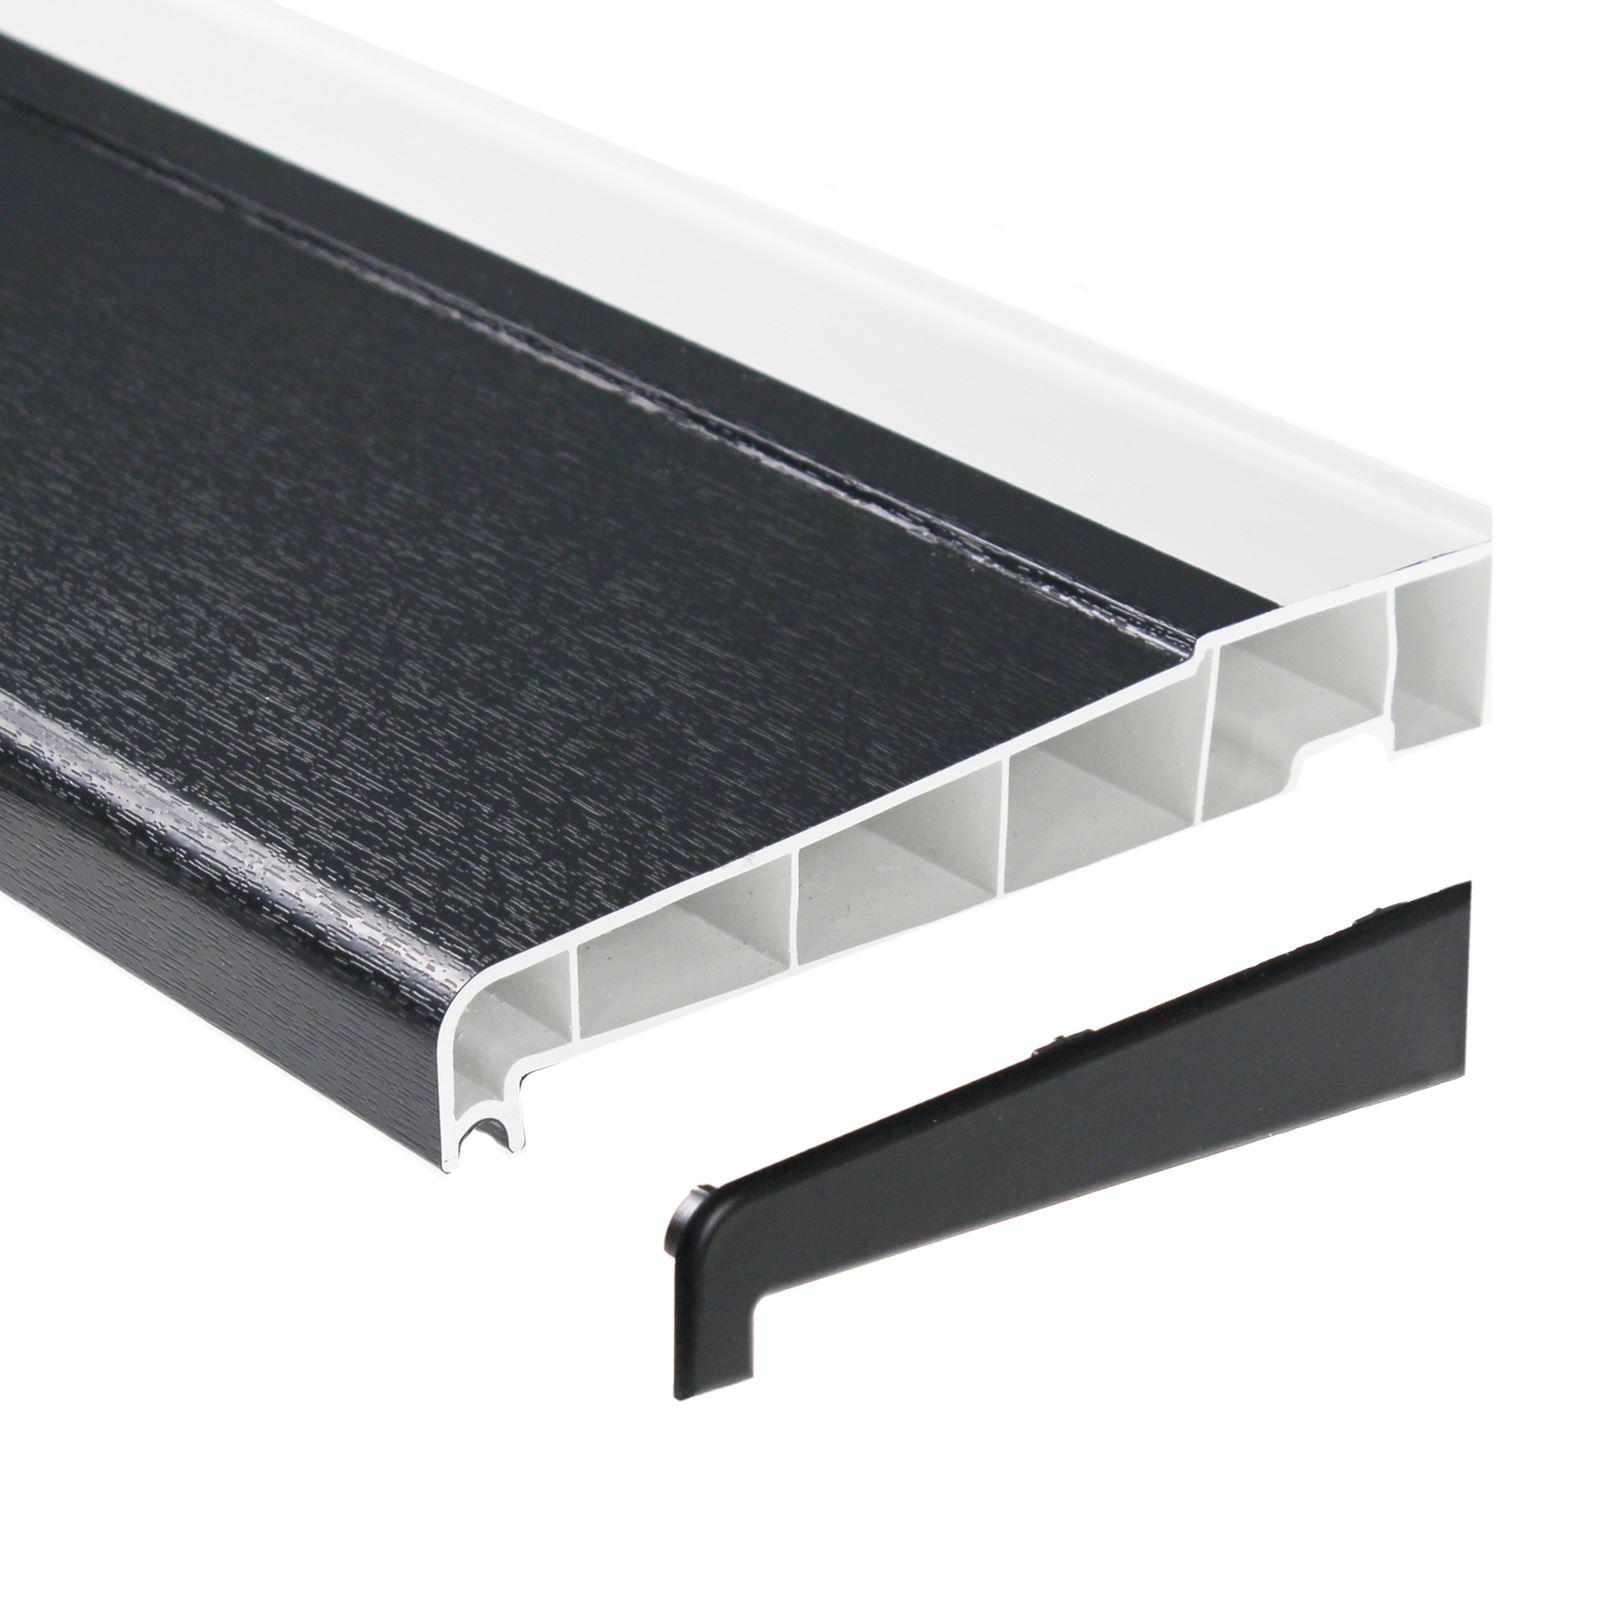 180mm Upvc External Sill For Window Door Patio Pvc Plastic